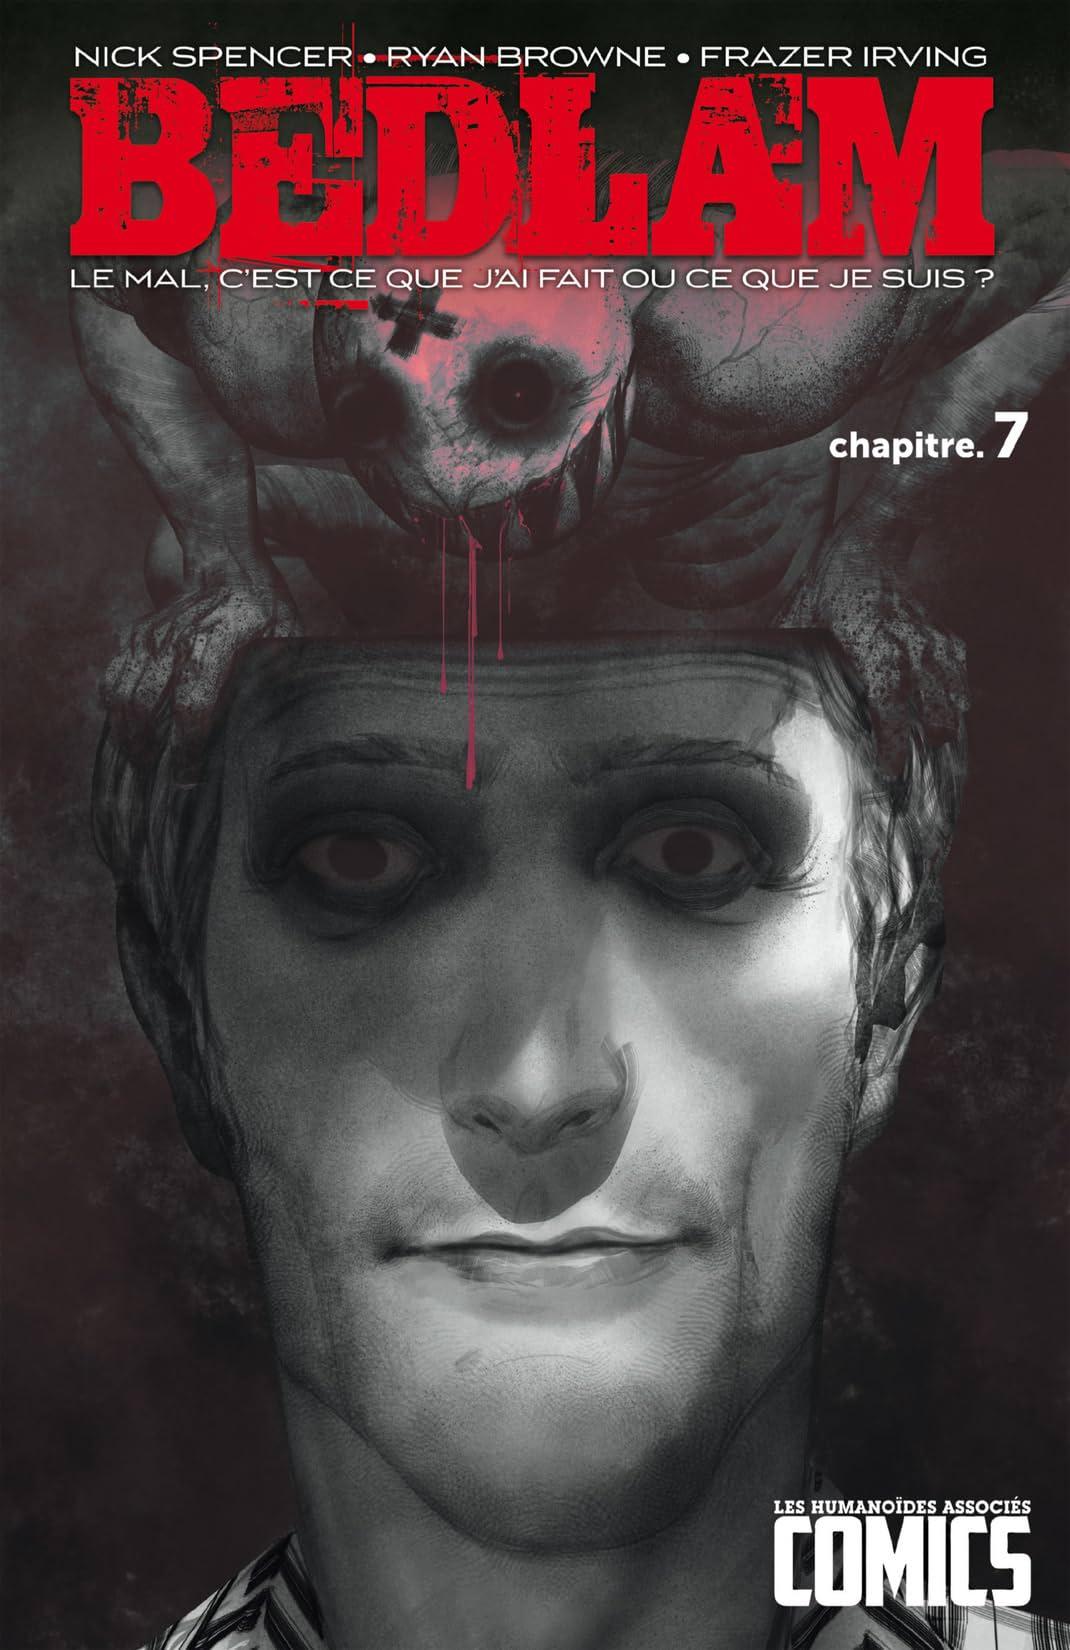 Bedlam: Chapitre 7